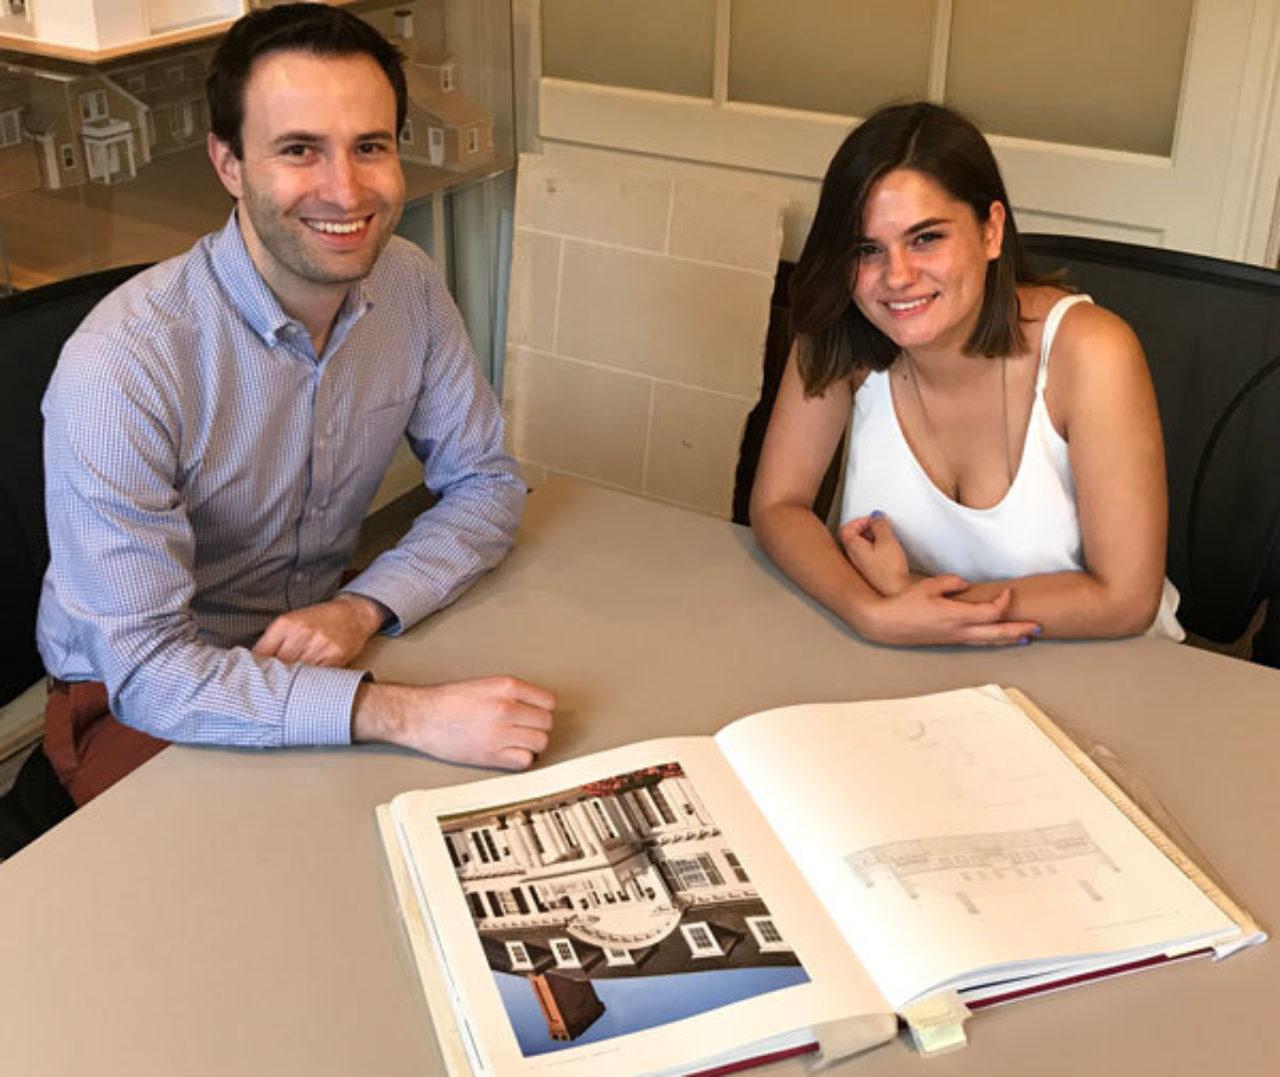 Mentor Rodrigo Bollat Montenegro with student Fionna Banchs Rios